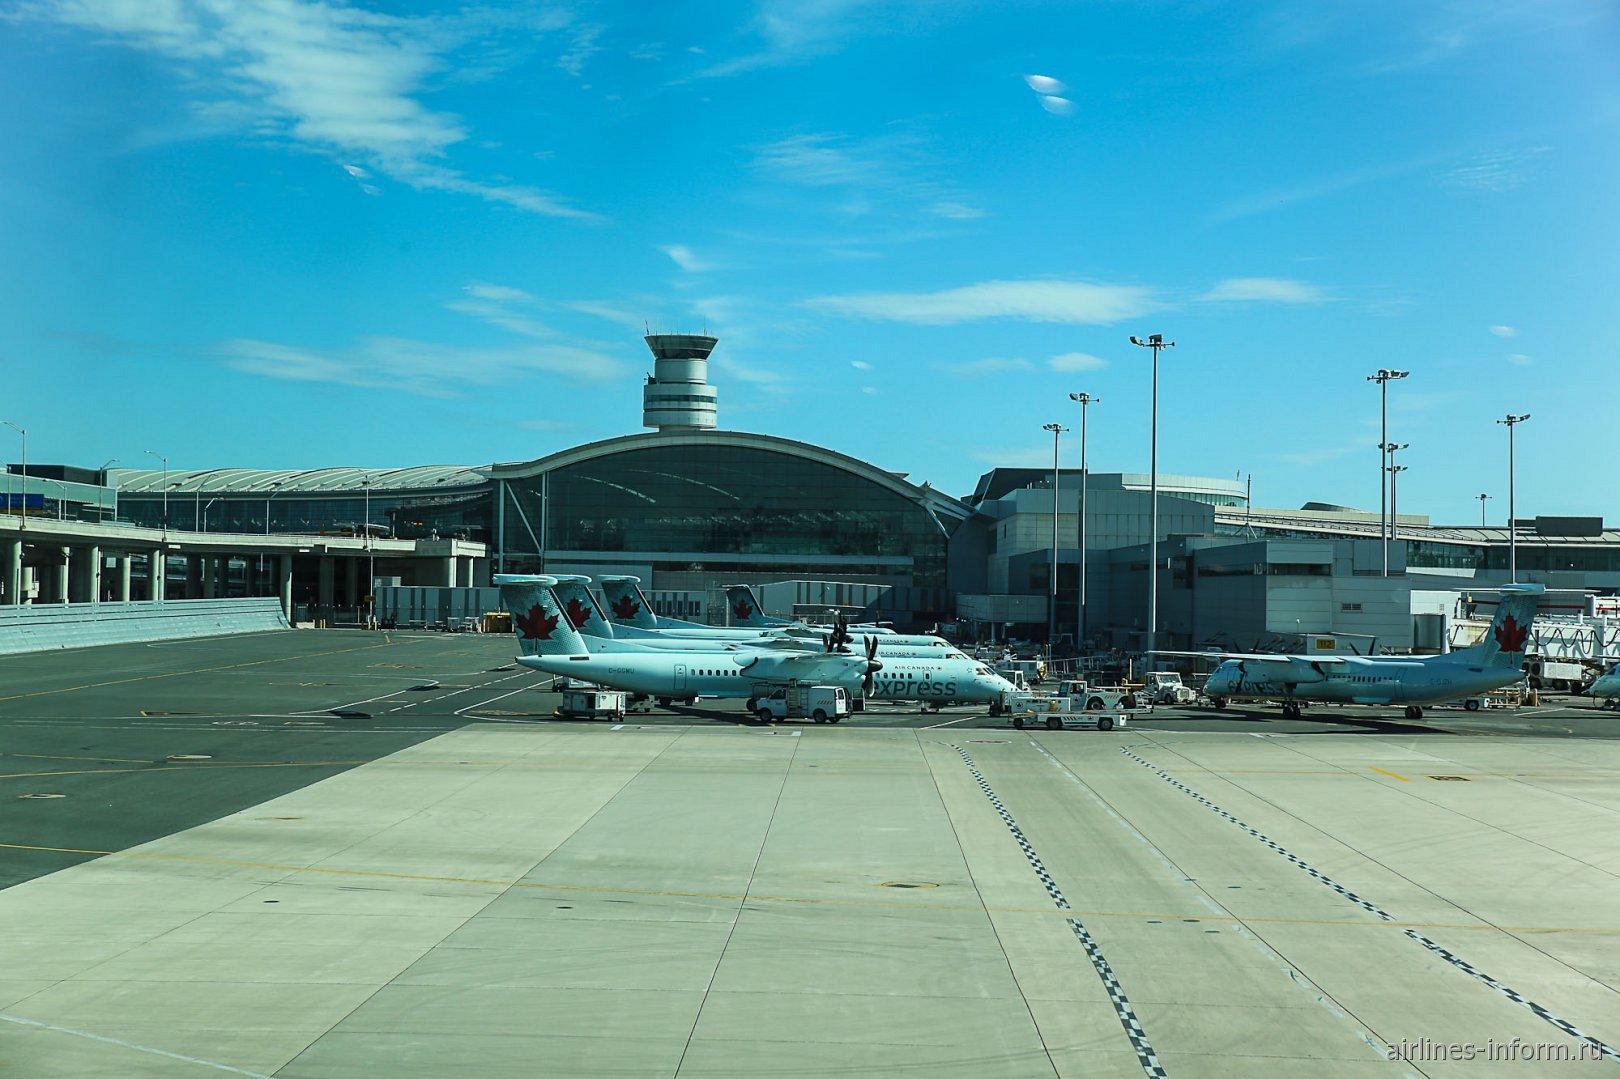 Терминал 1 аэропорта Торонто Пирсон